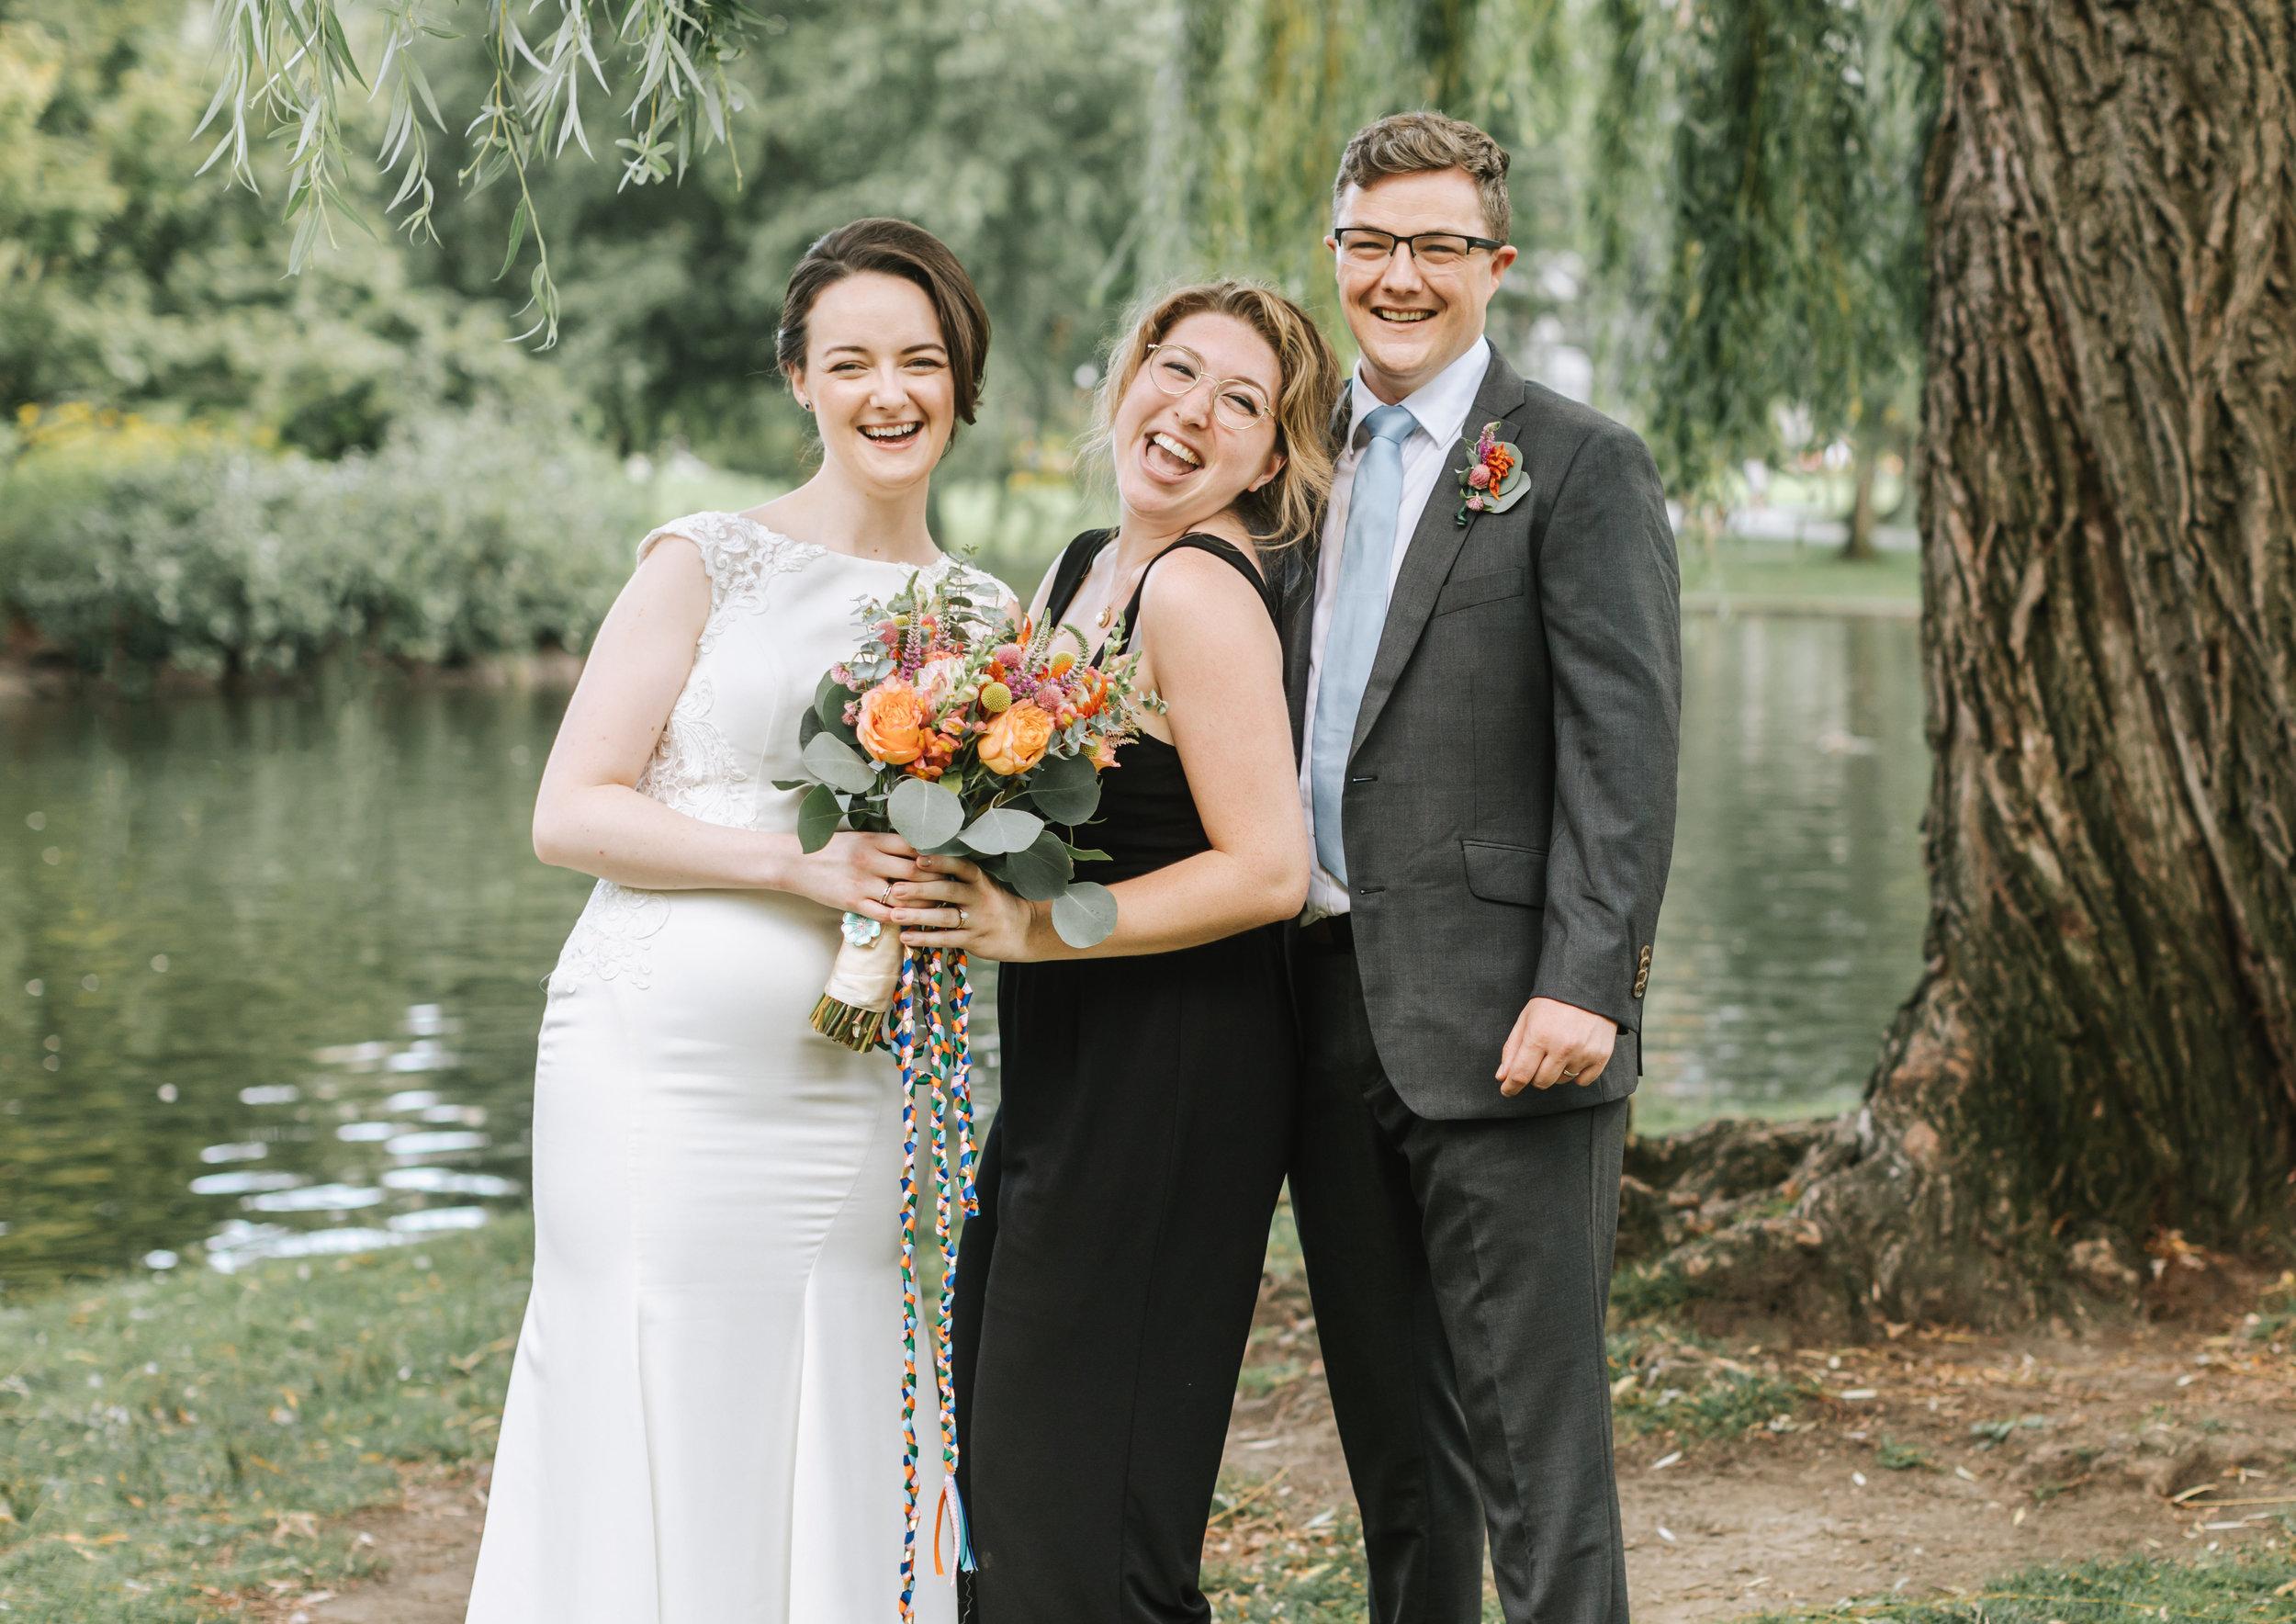 Elaine-Conor-Wedding-0068.JPG